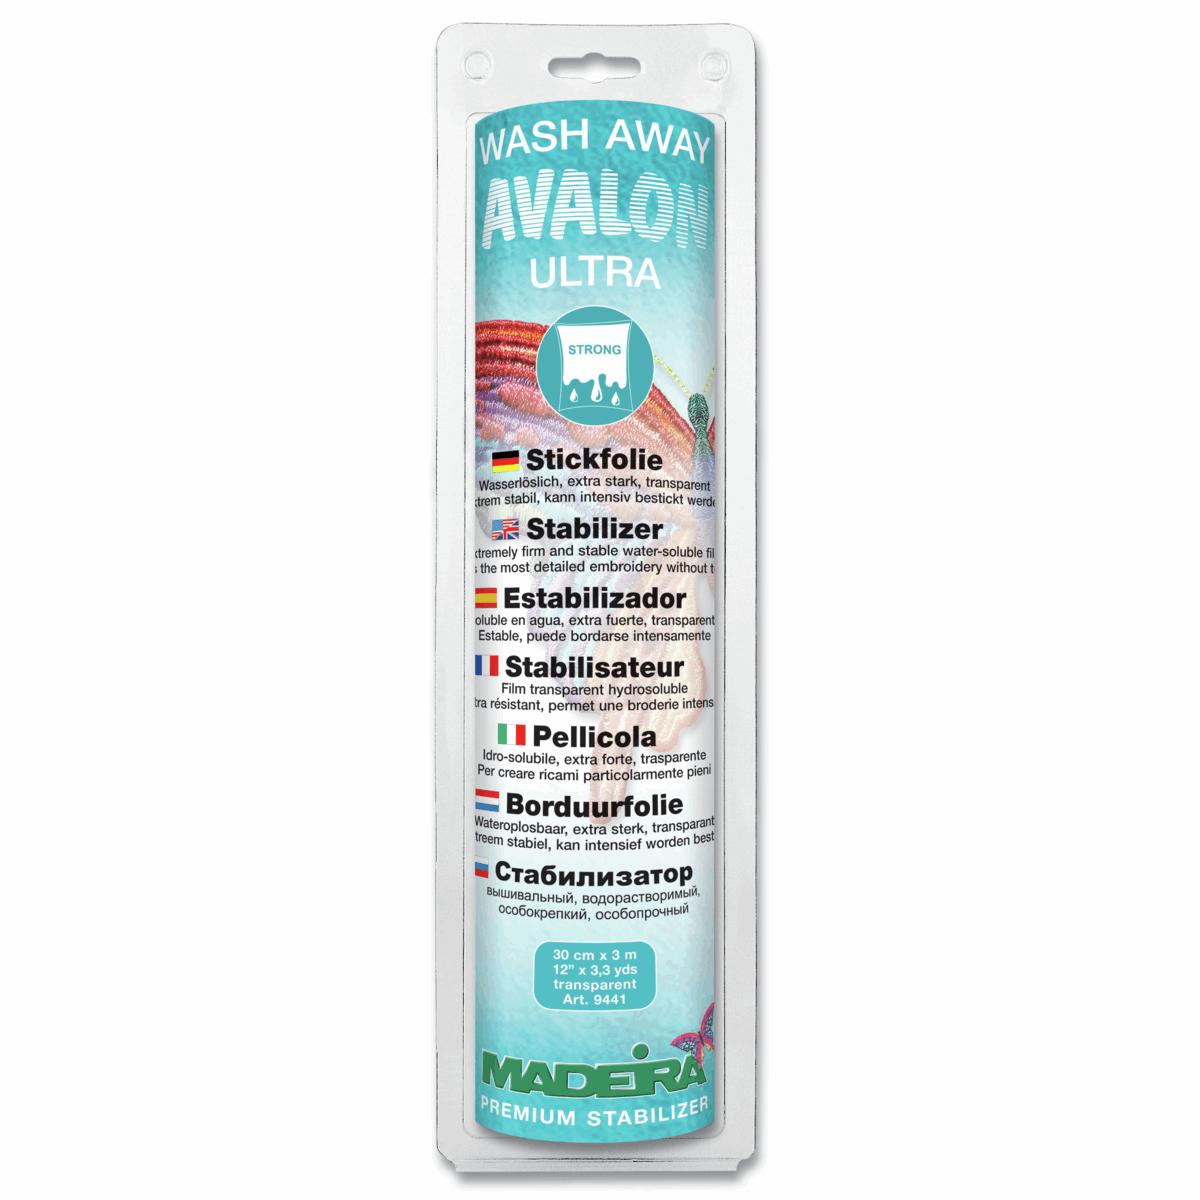 Avalon Fix Madeira Stabilizer: Wash-Away: Avalon Fix,Plus,Ultra or Film